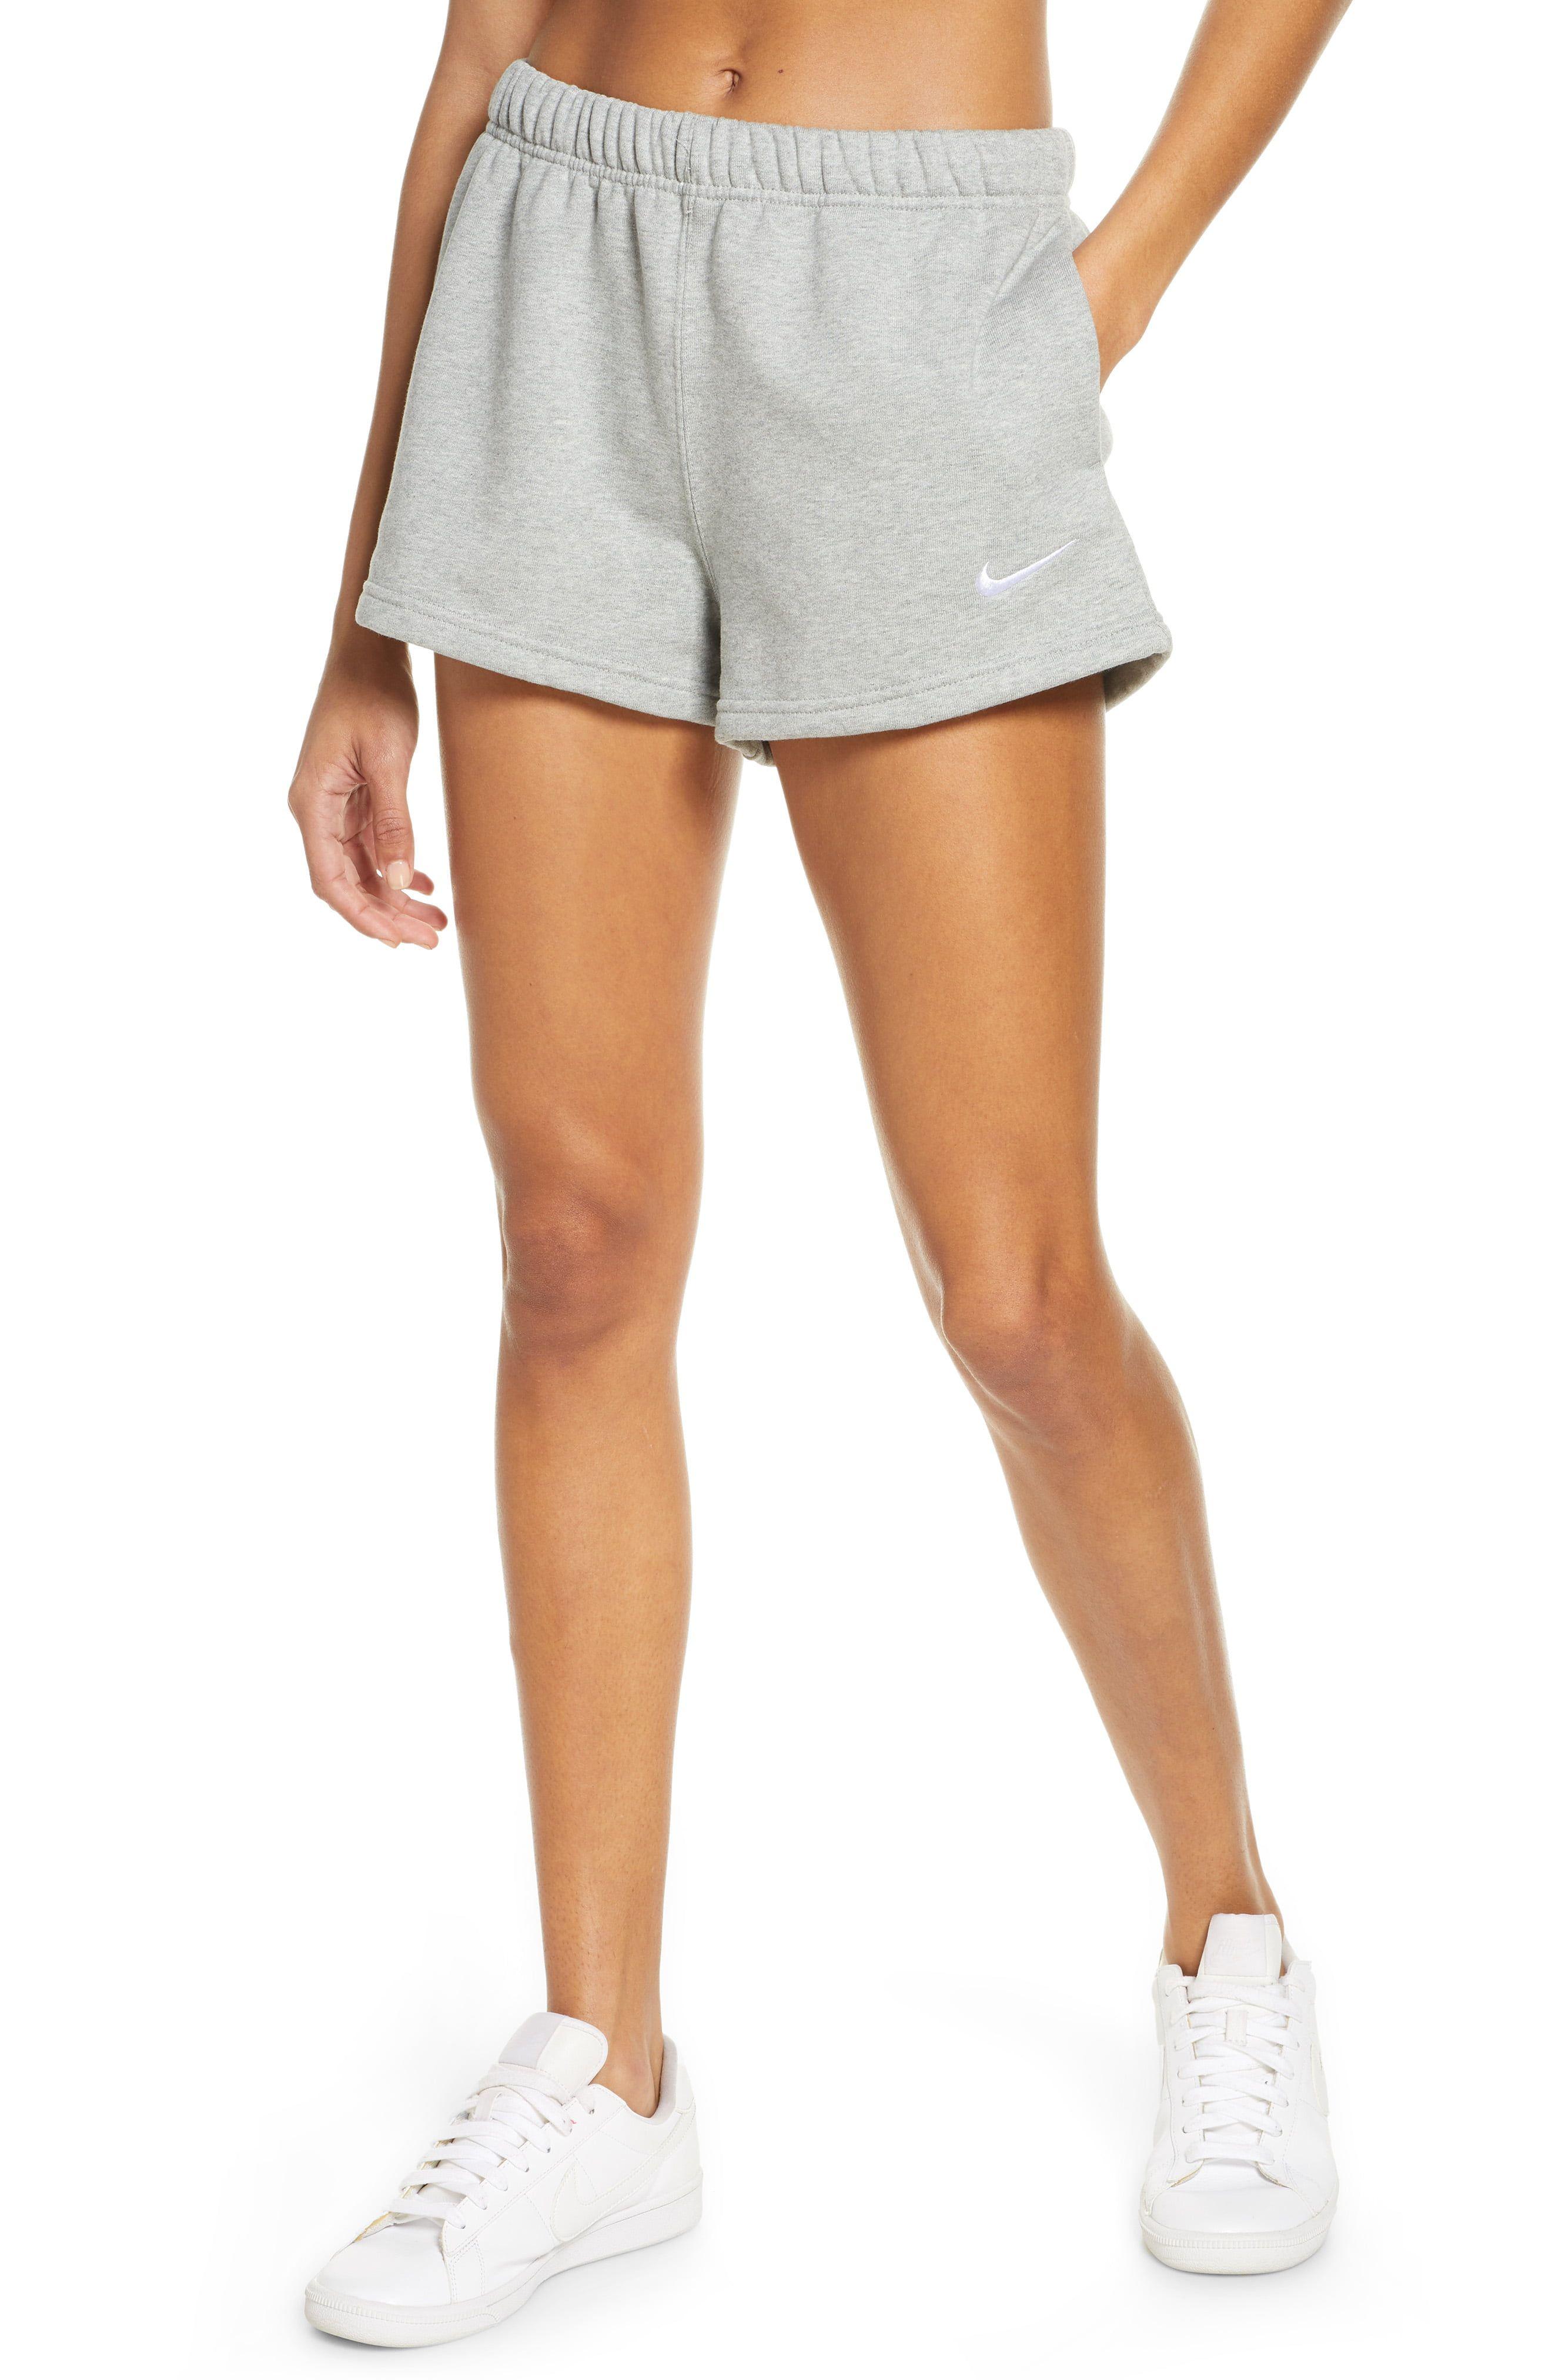 Nike NikeLab Collection Women's Fleece Shorts | Nordstrom in ...